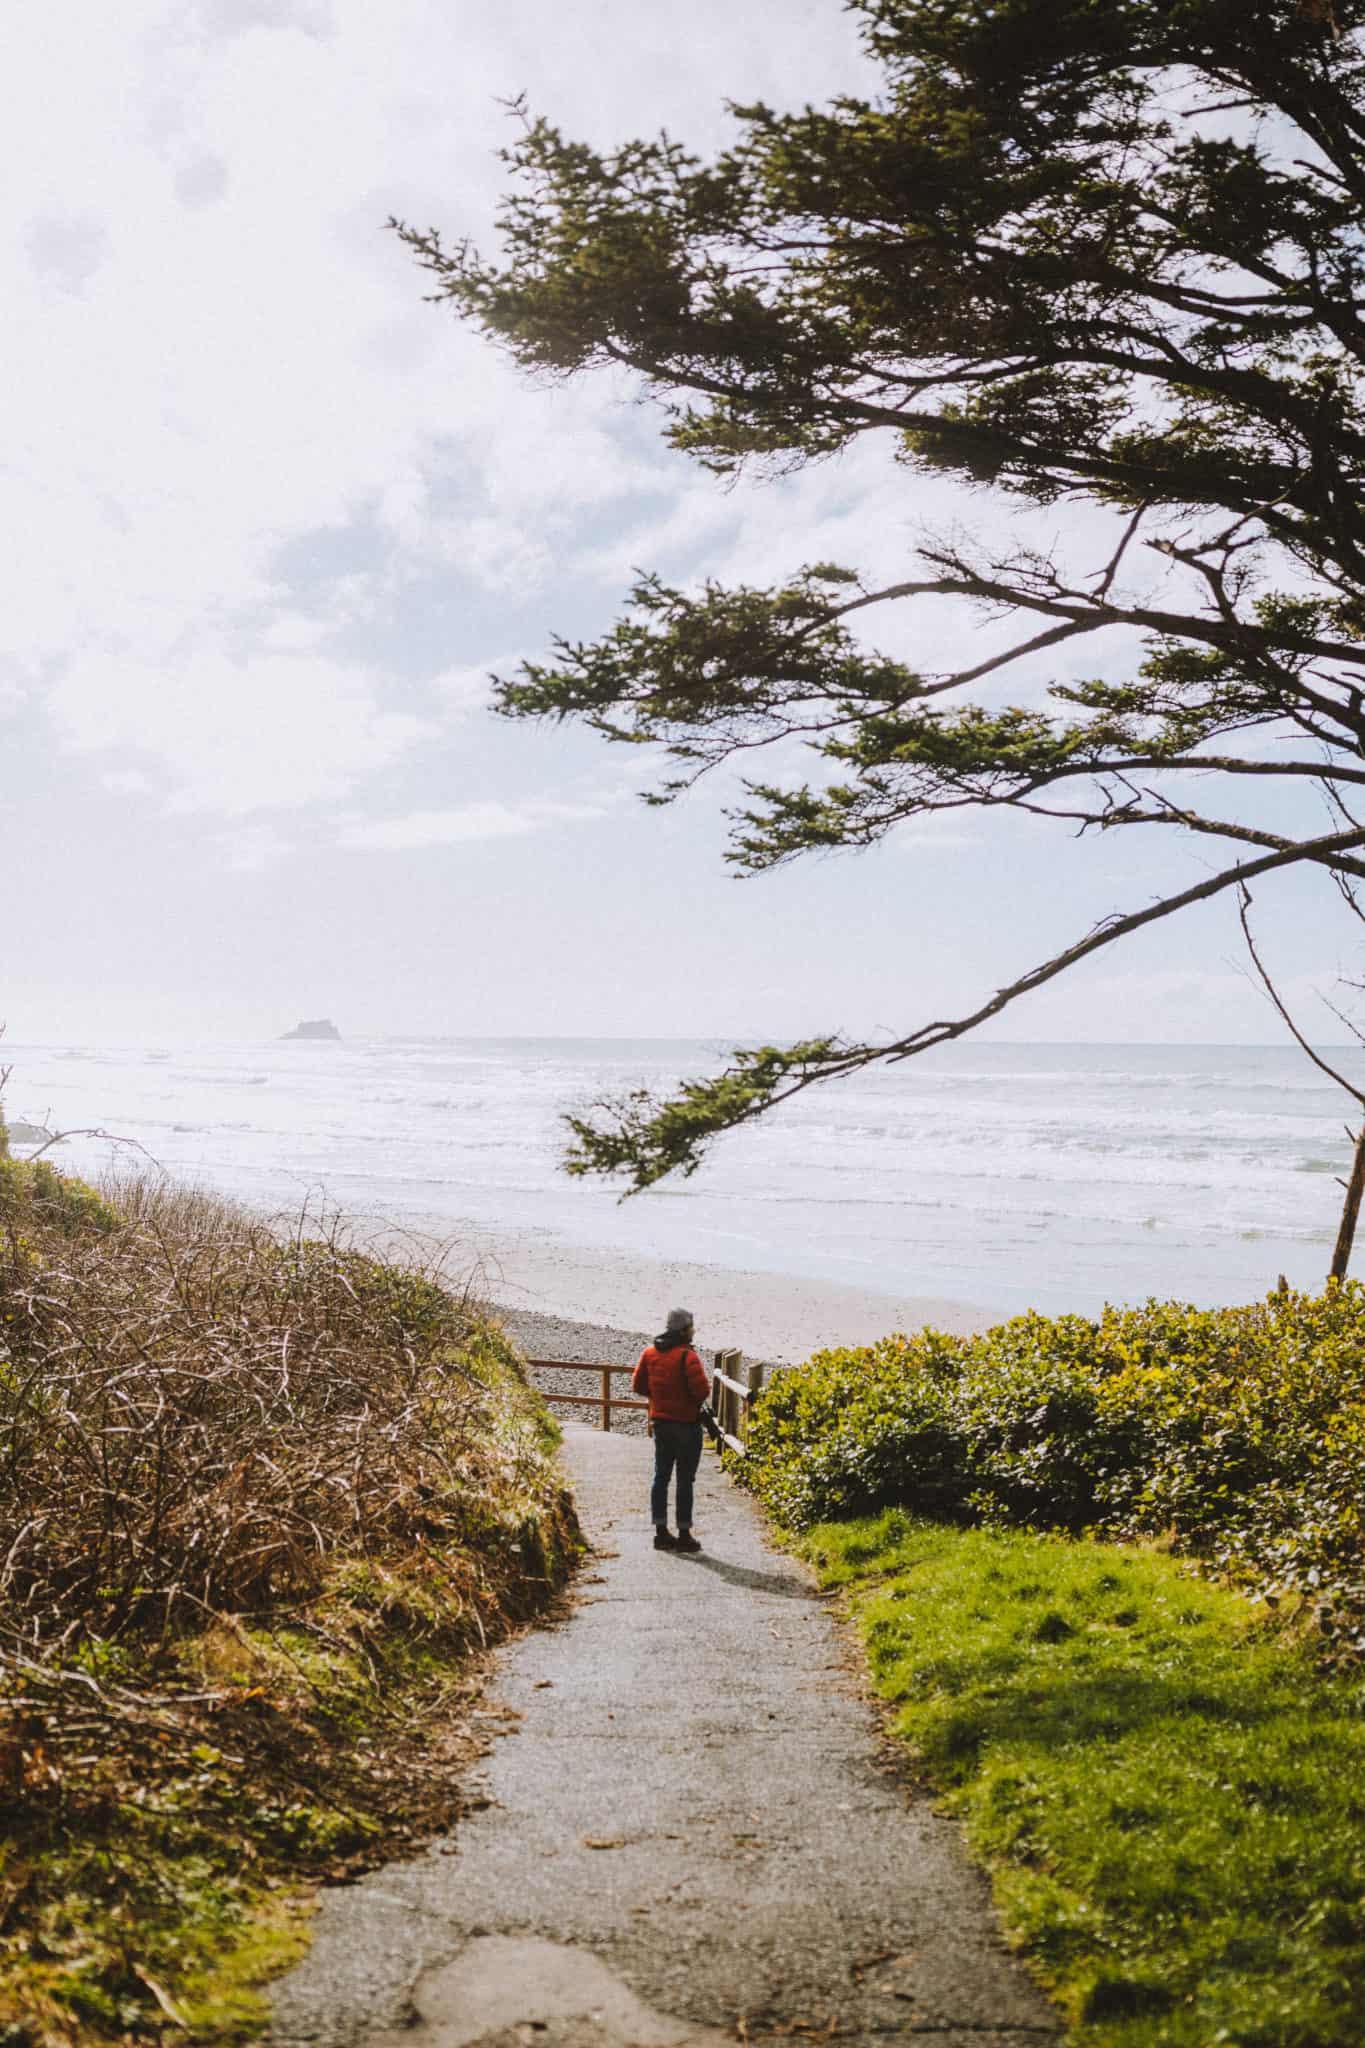 Berty on trail at Hug Point Beach - Oregon Coast - TheMandagies.com